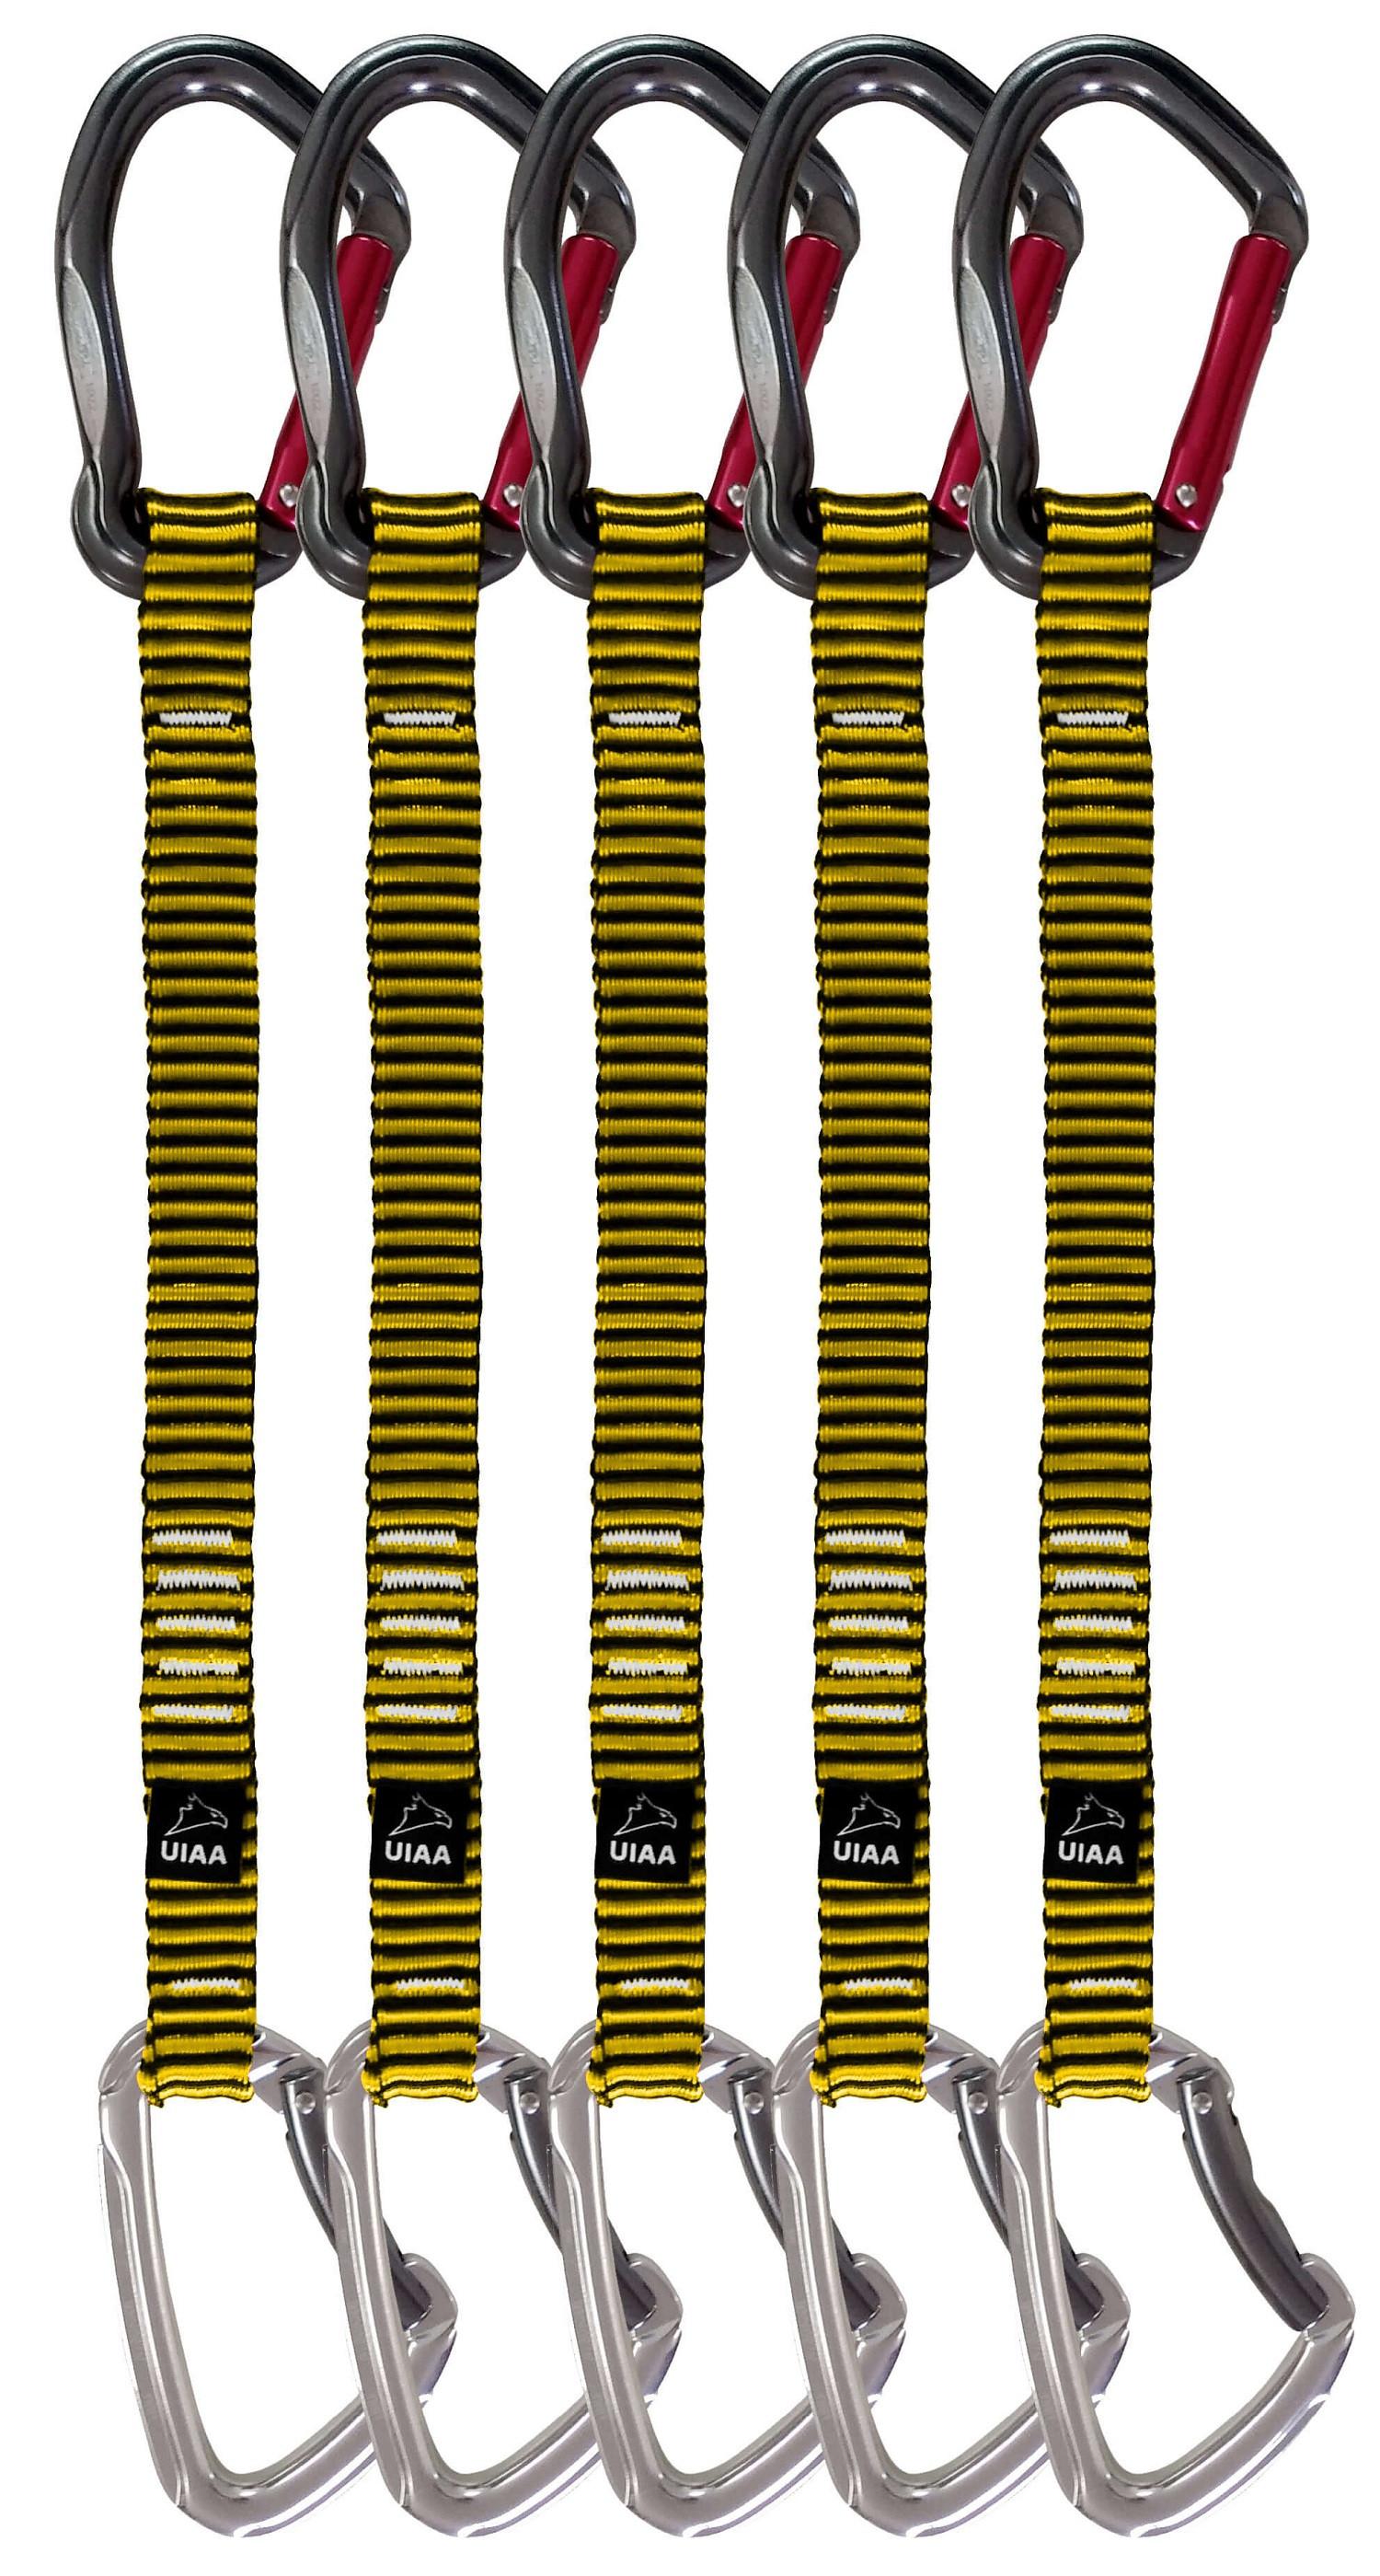 KIt de Costura Expressa 30 cm (5 uni) Conquista